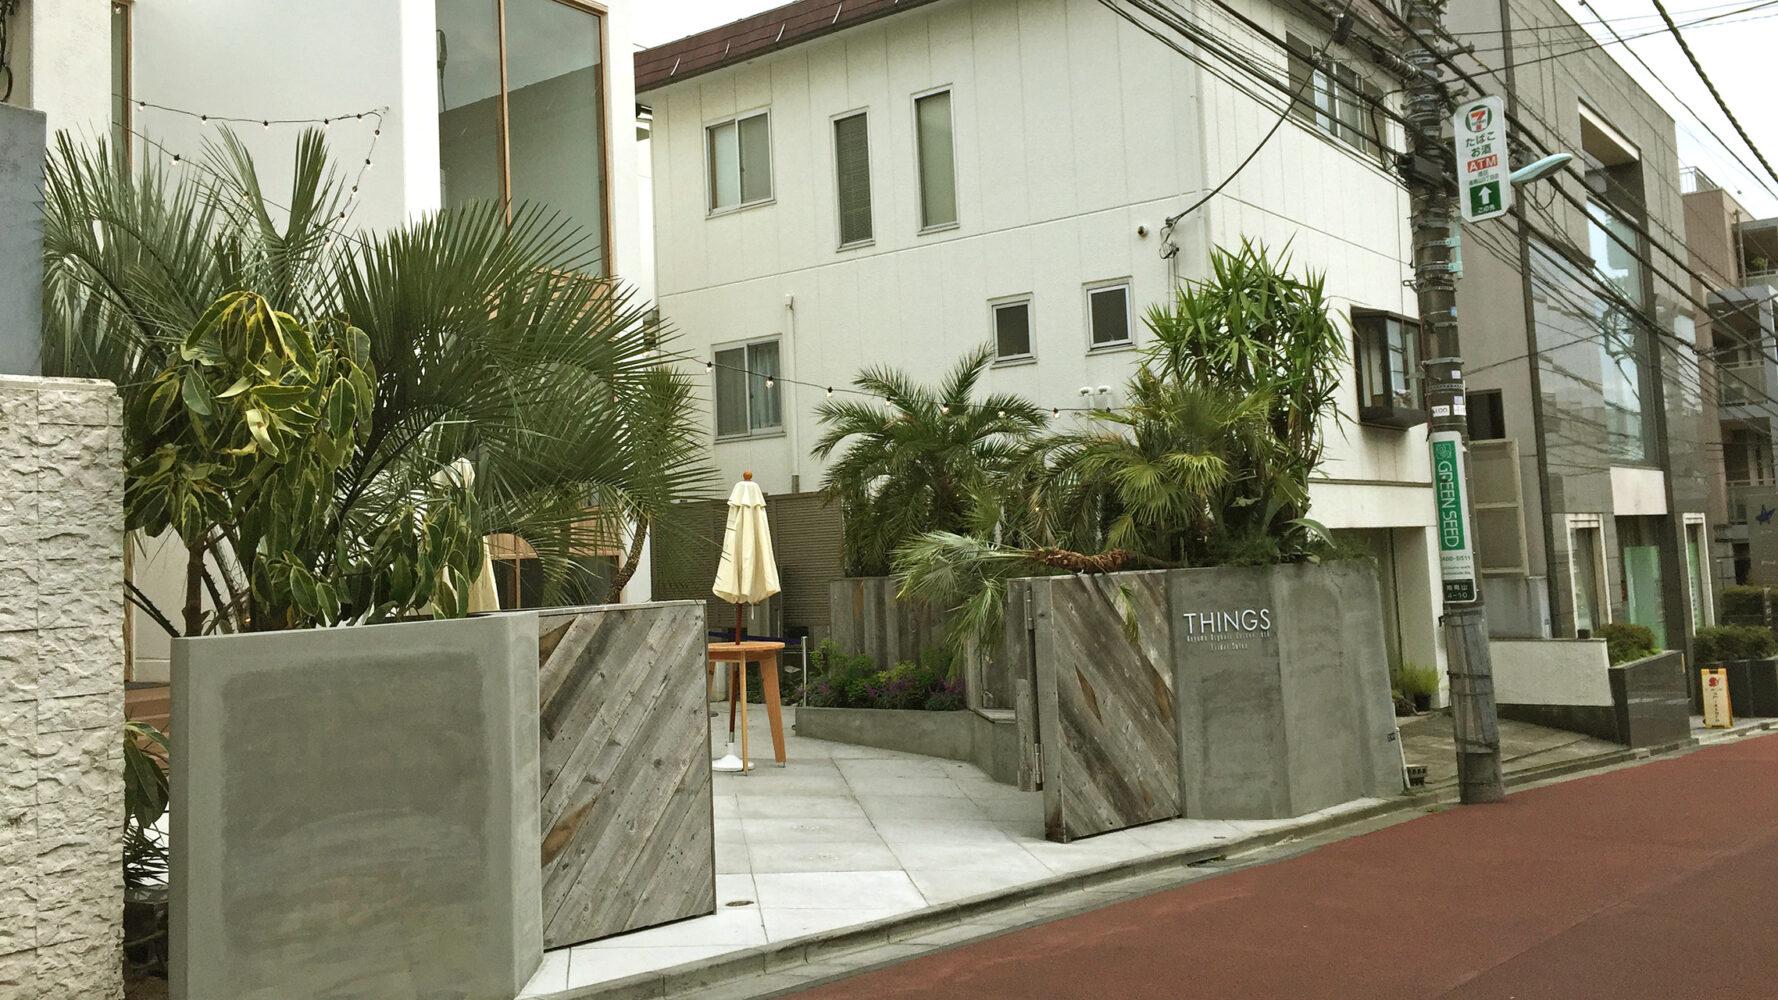 THINGS Aoyama Organic Garden.dth 事例画像5